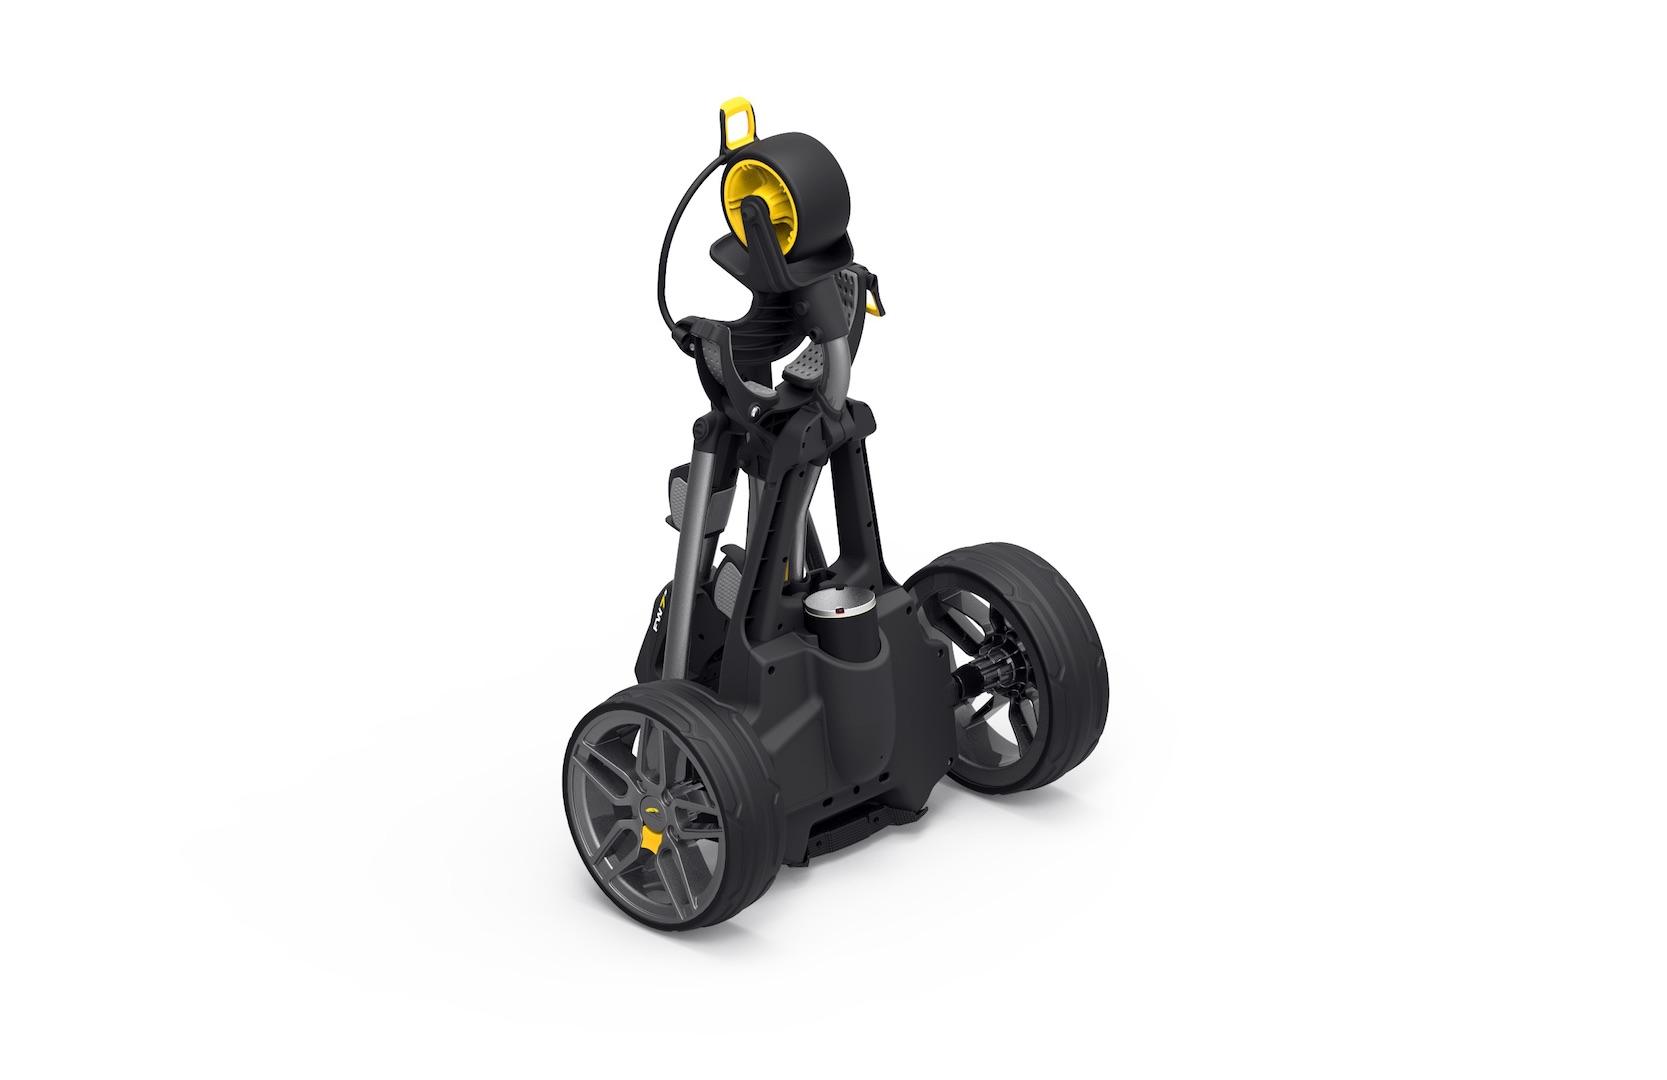 Powakaddy launch world's most advanced golf trolley